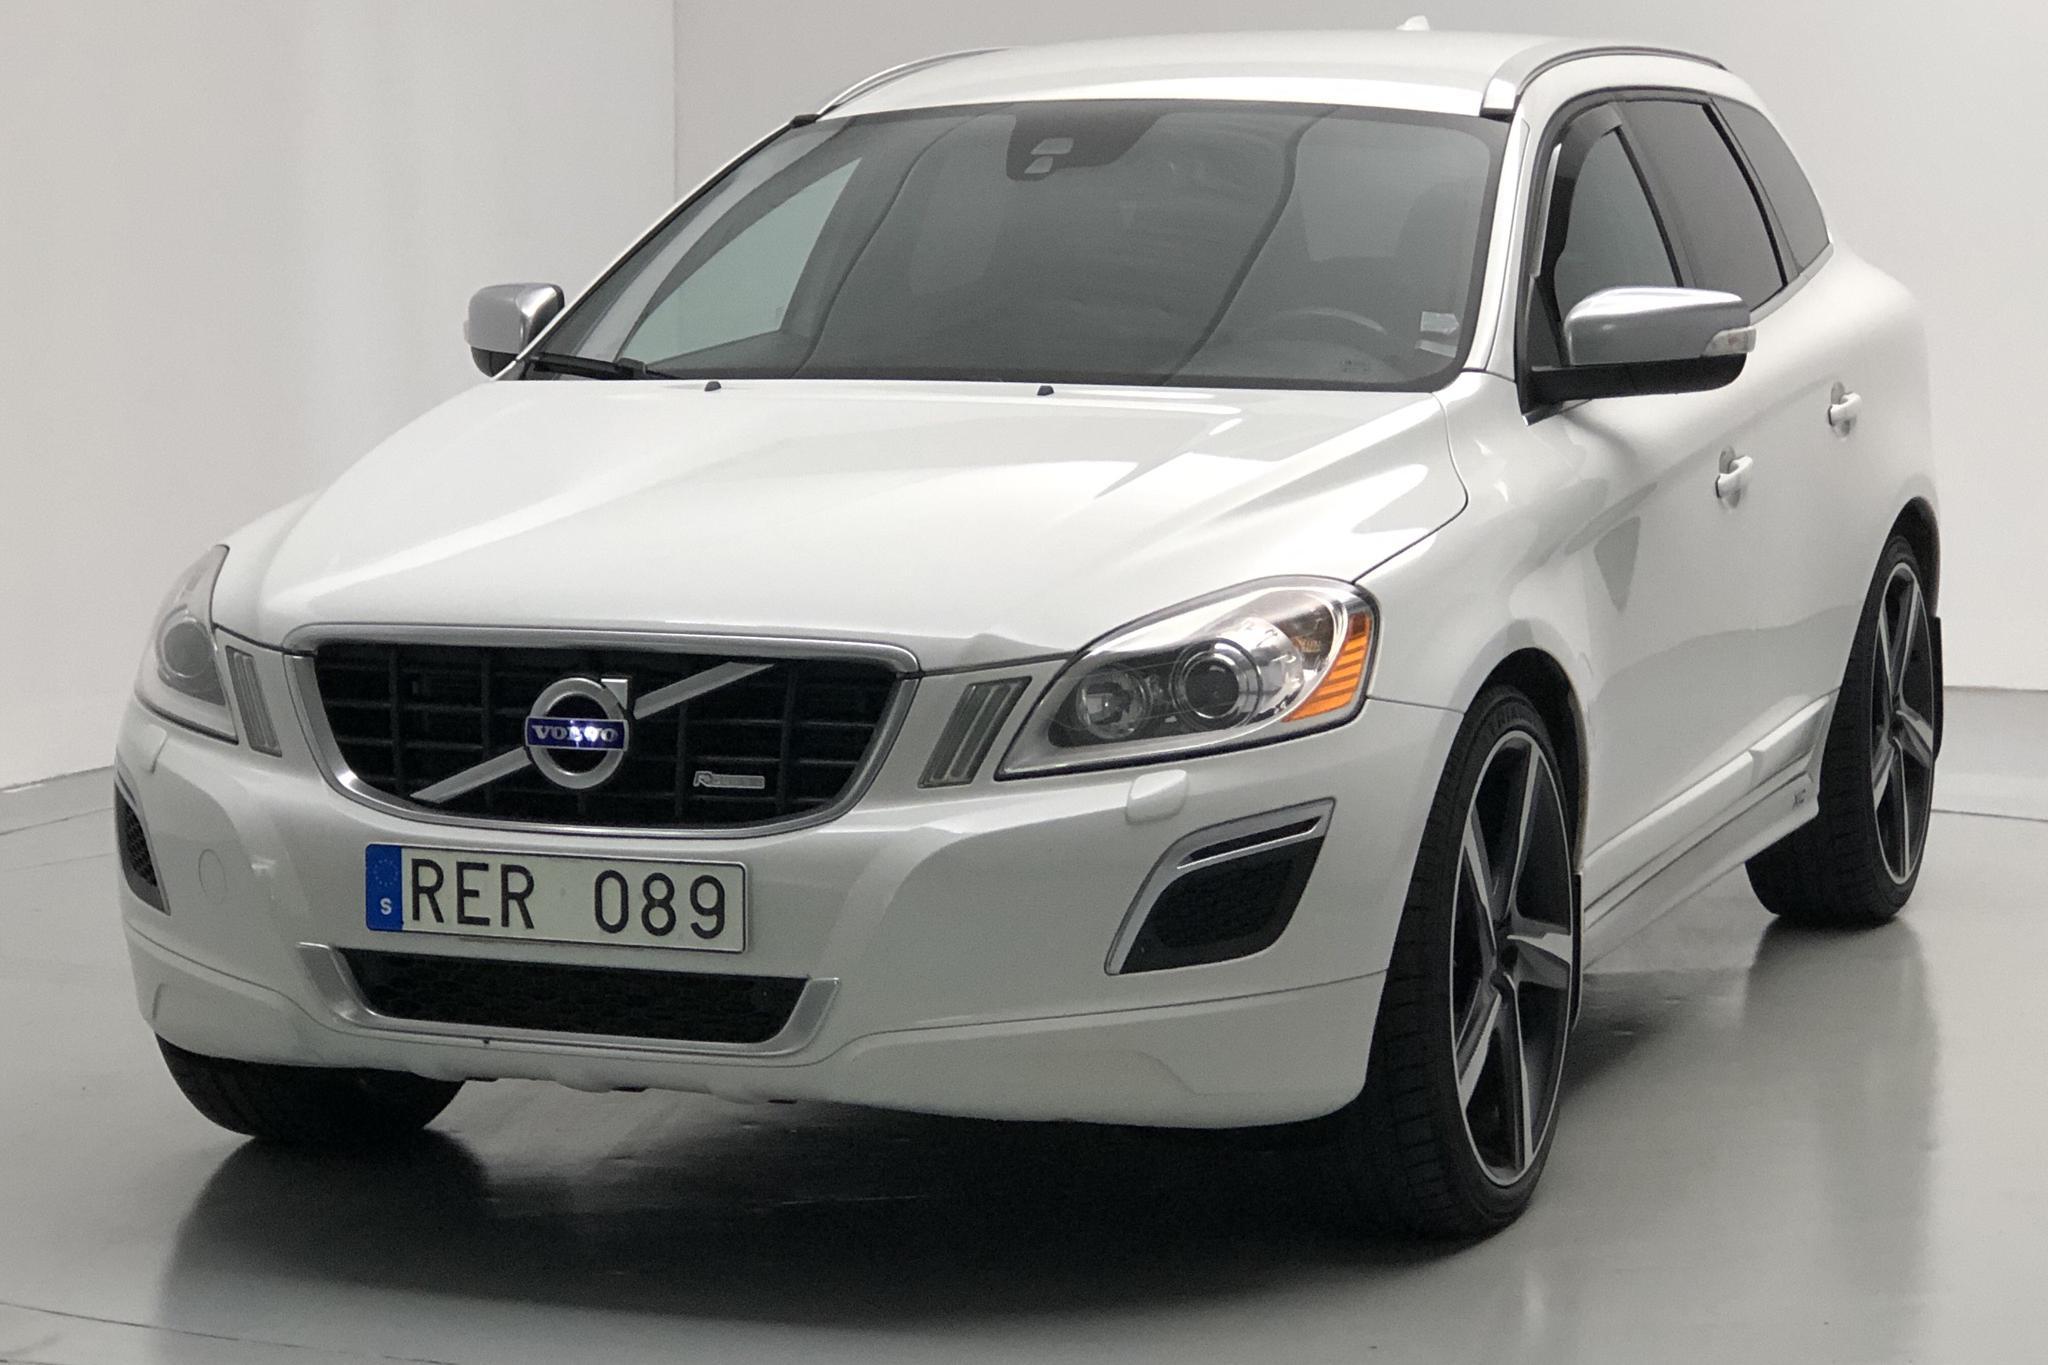 Volvo XC60 D4 2WD (163hk) - 201 440 km - Automatic - white - 2013